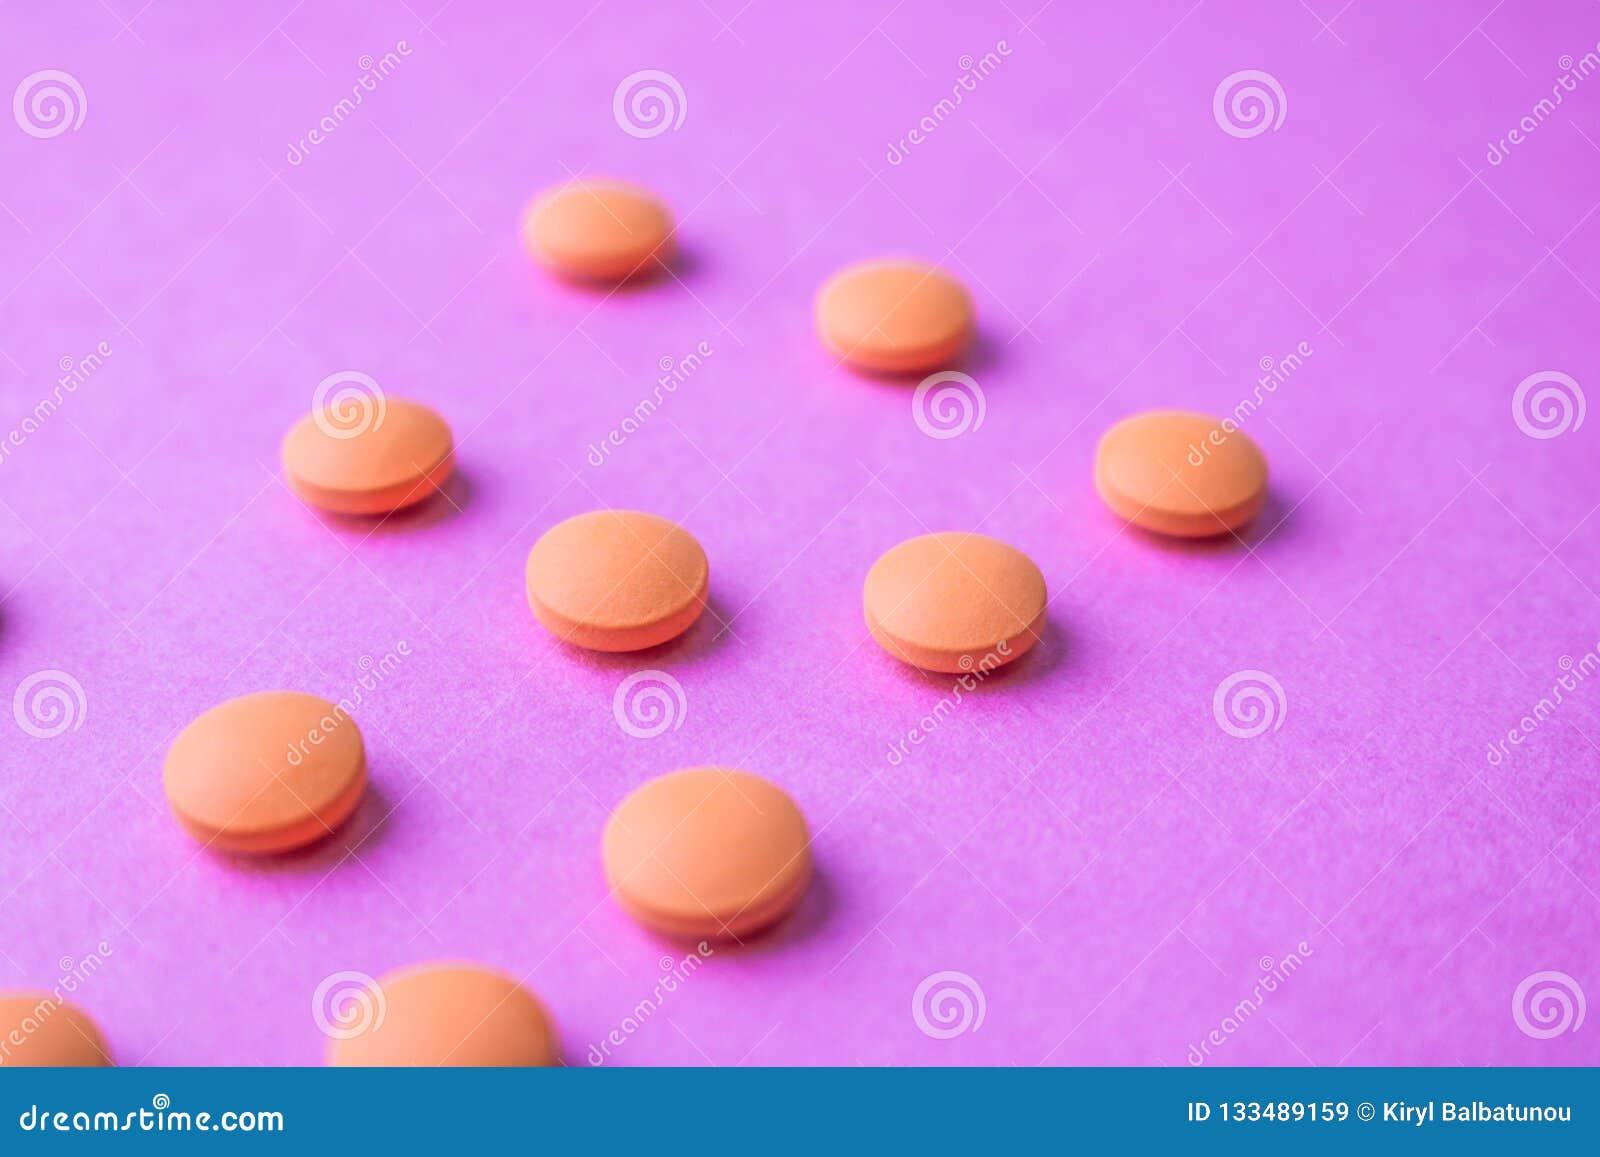 Small Yellow Orange Beautiful Medical Pharmaceptic Round